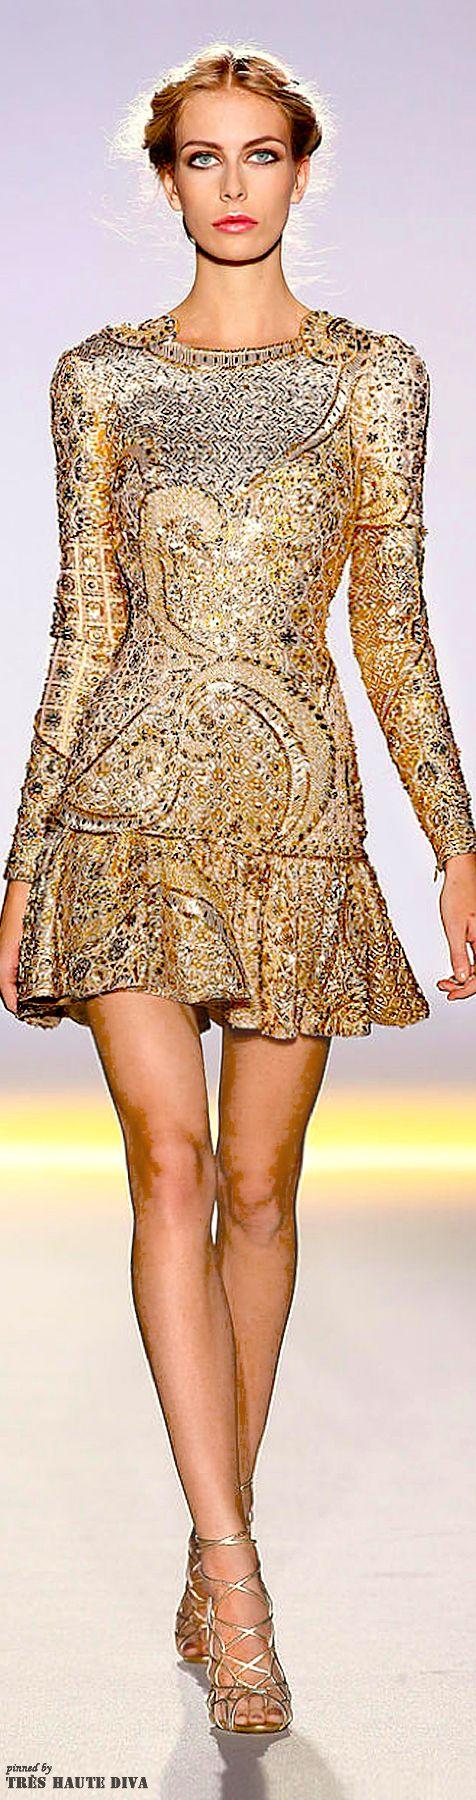 Zuhair Murad Spring/Summer 2013 Couture http://www.epicee.com